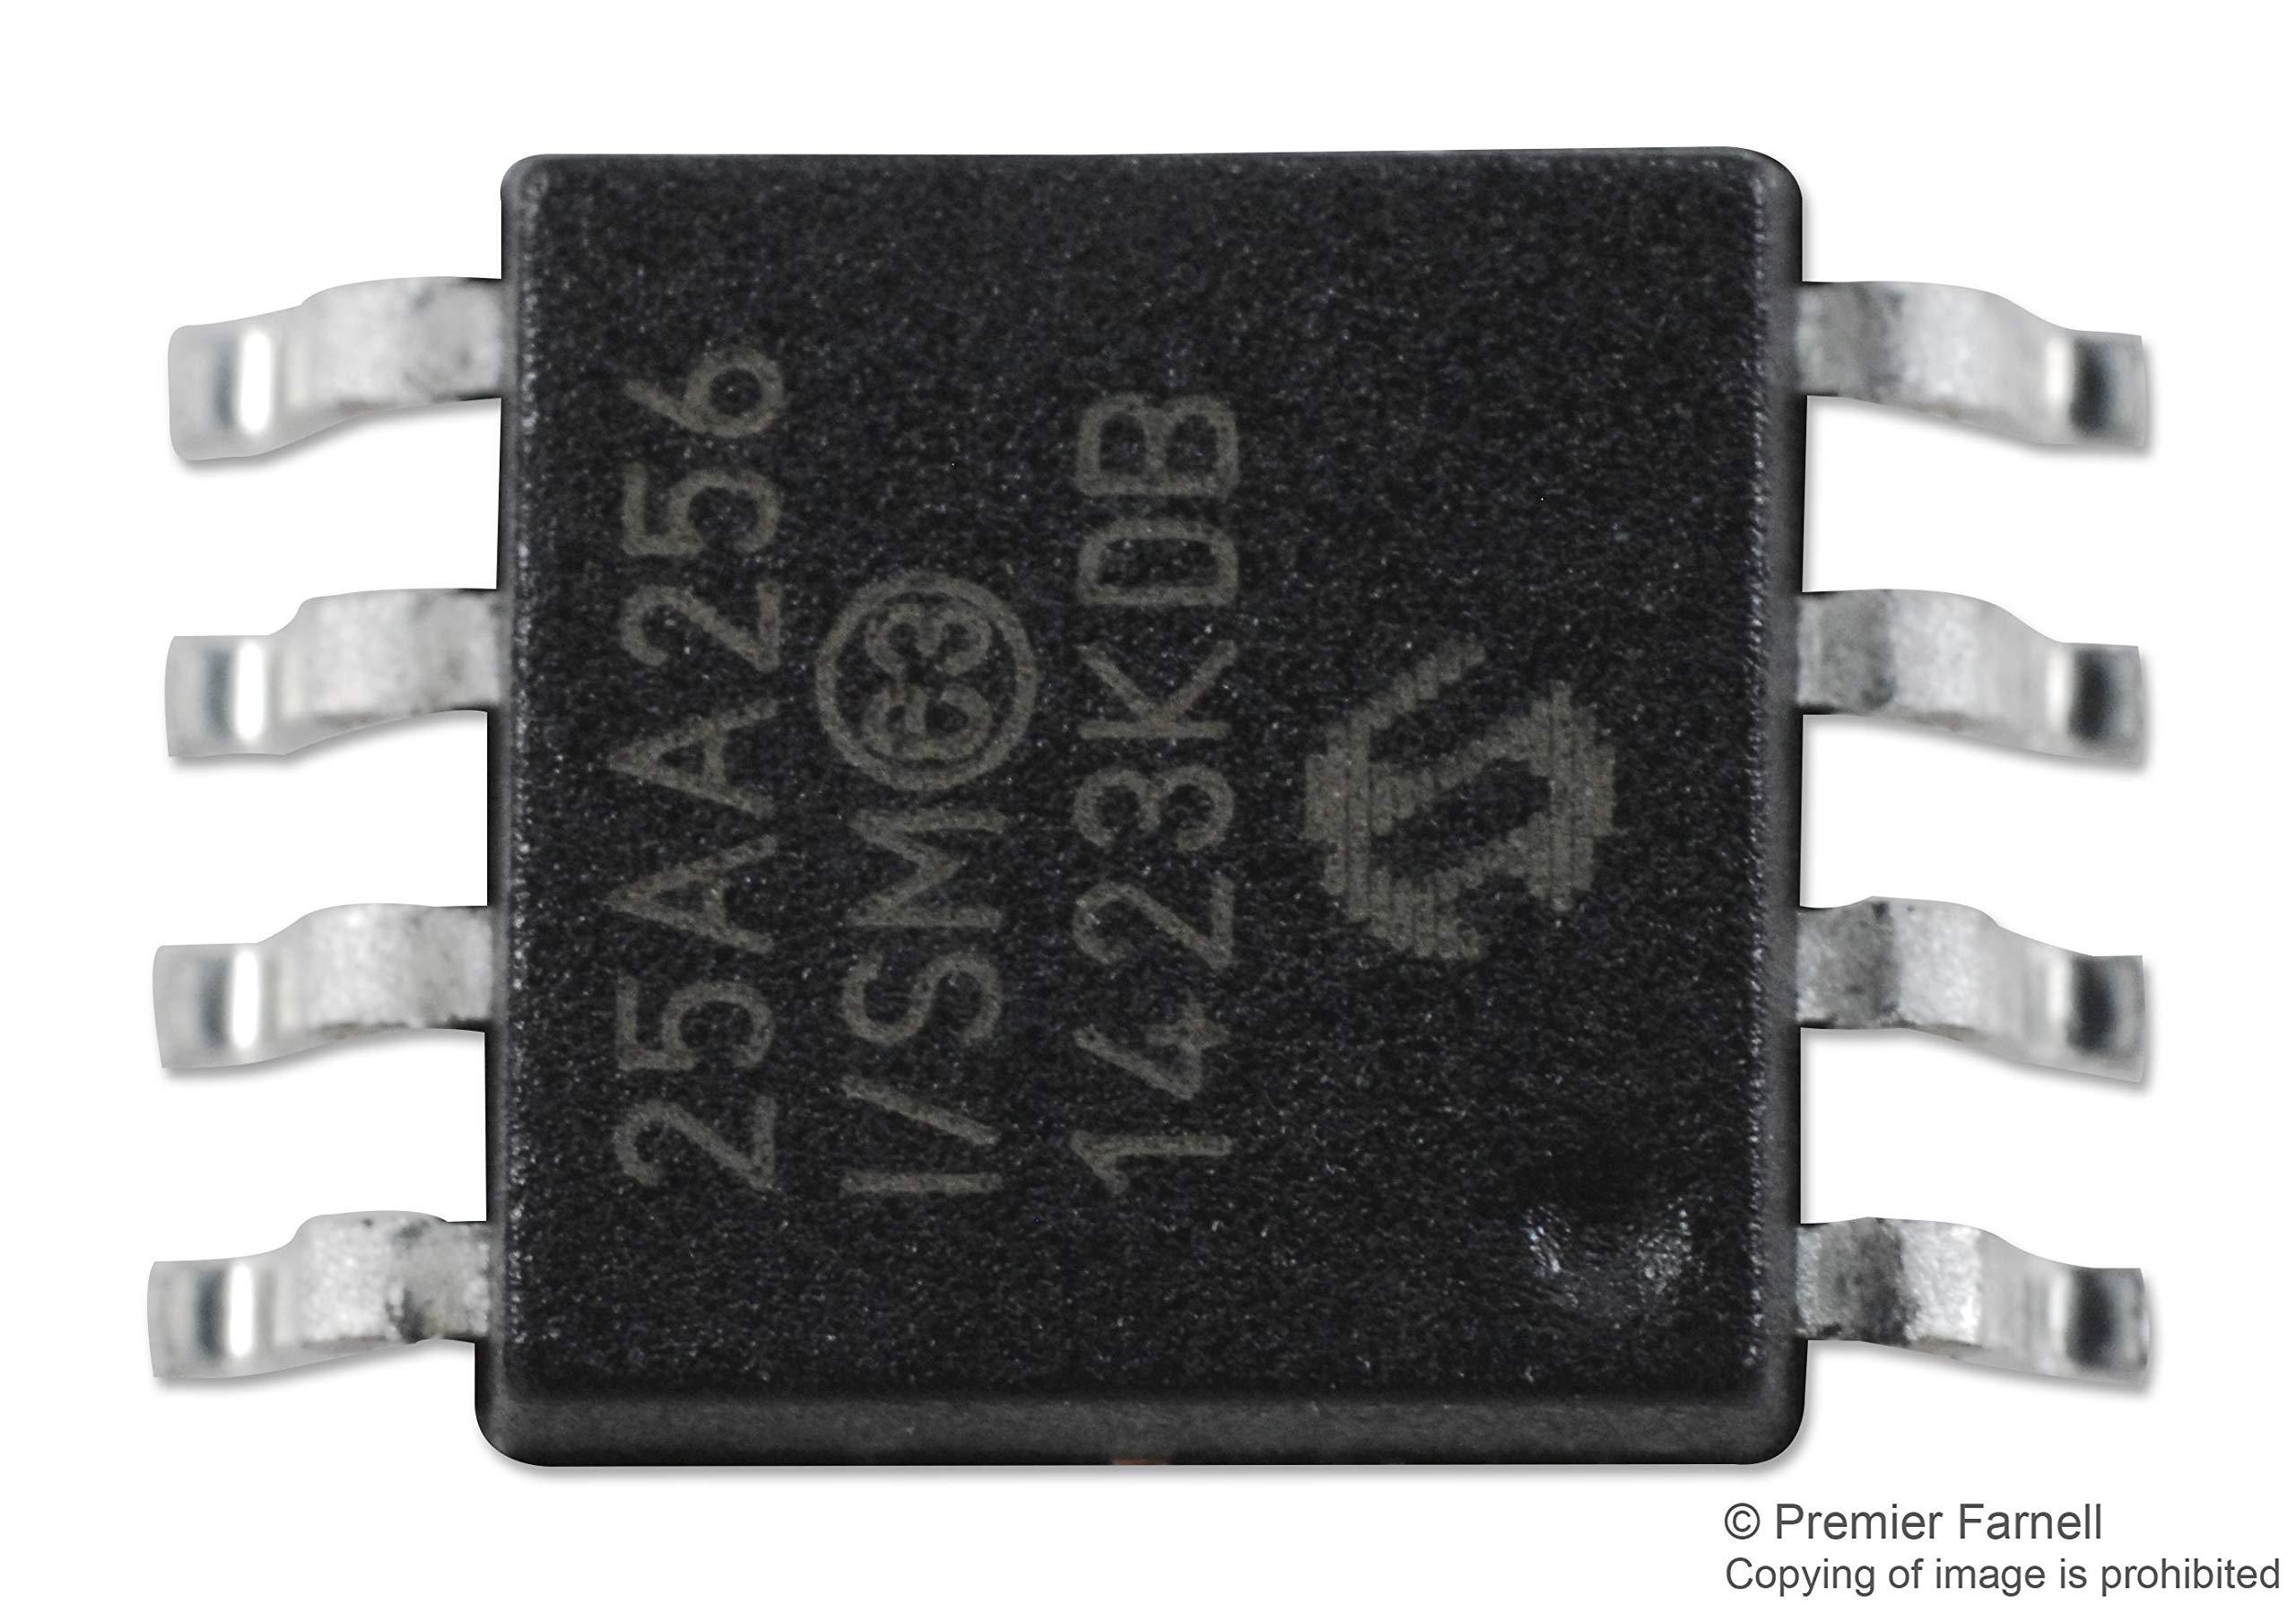 25AA256-I/SM - EEPROM, Serial SPI, 256 Kbit, 32K x 8bit, 10 MHz, SOIJ, 8 Pins (Pack of 20) (25AA256-I/SM)